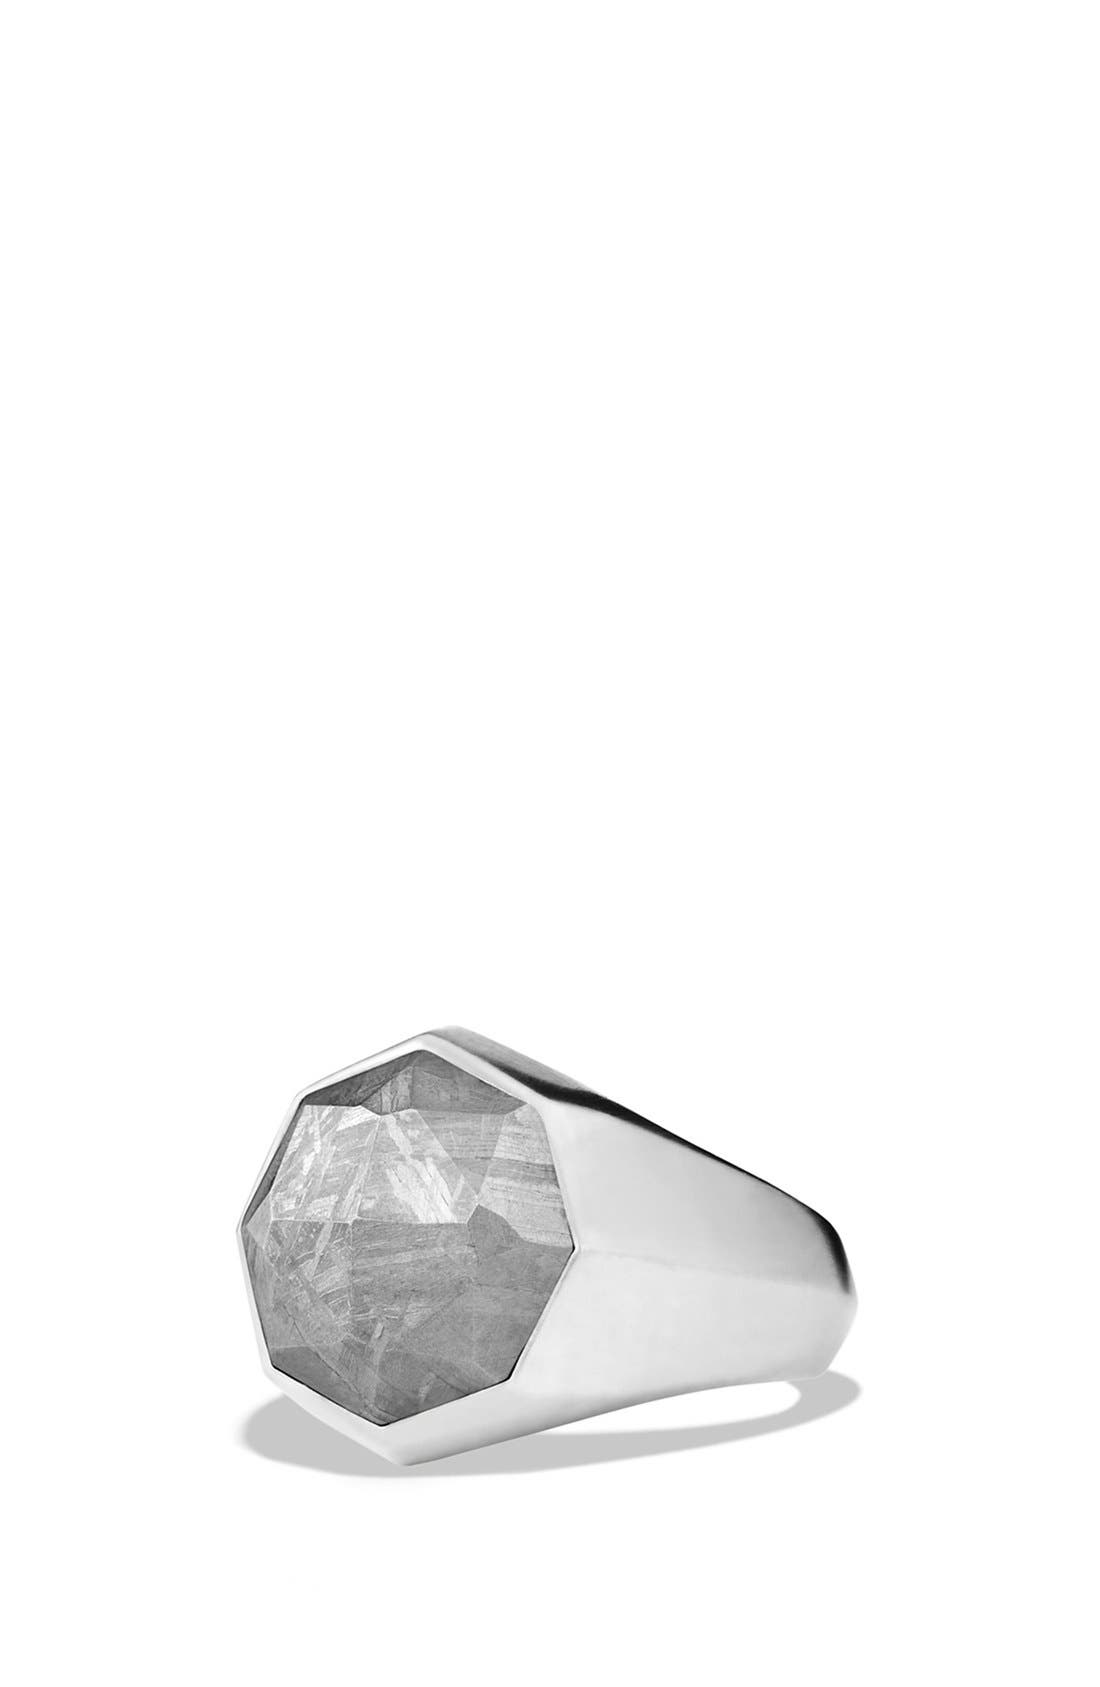 'Meteorite' Signet Ring,                             Main thumbnail 1, color,                             METEORITE